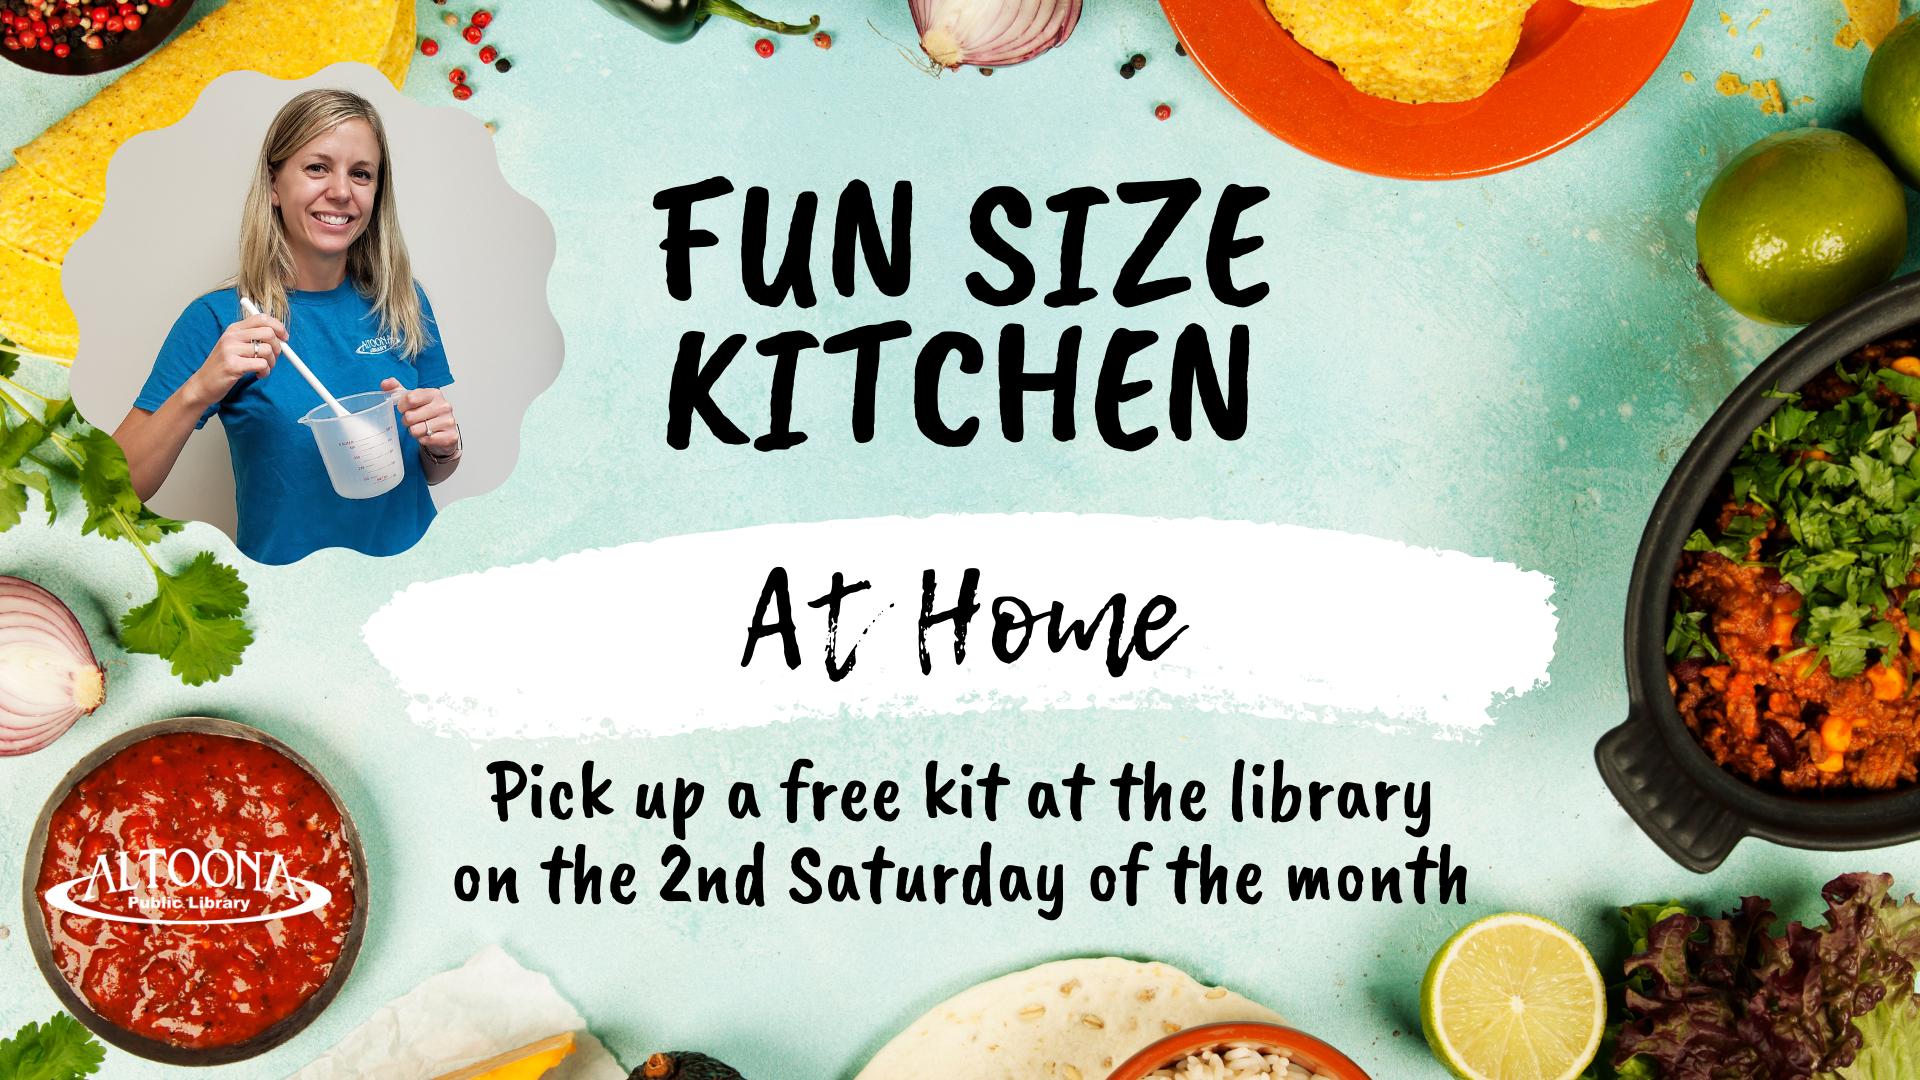 Fun Size Kitchen To-Go (Activity Kit)